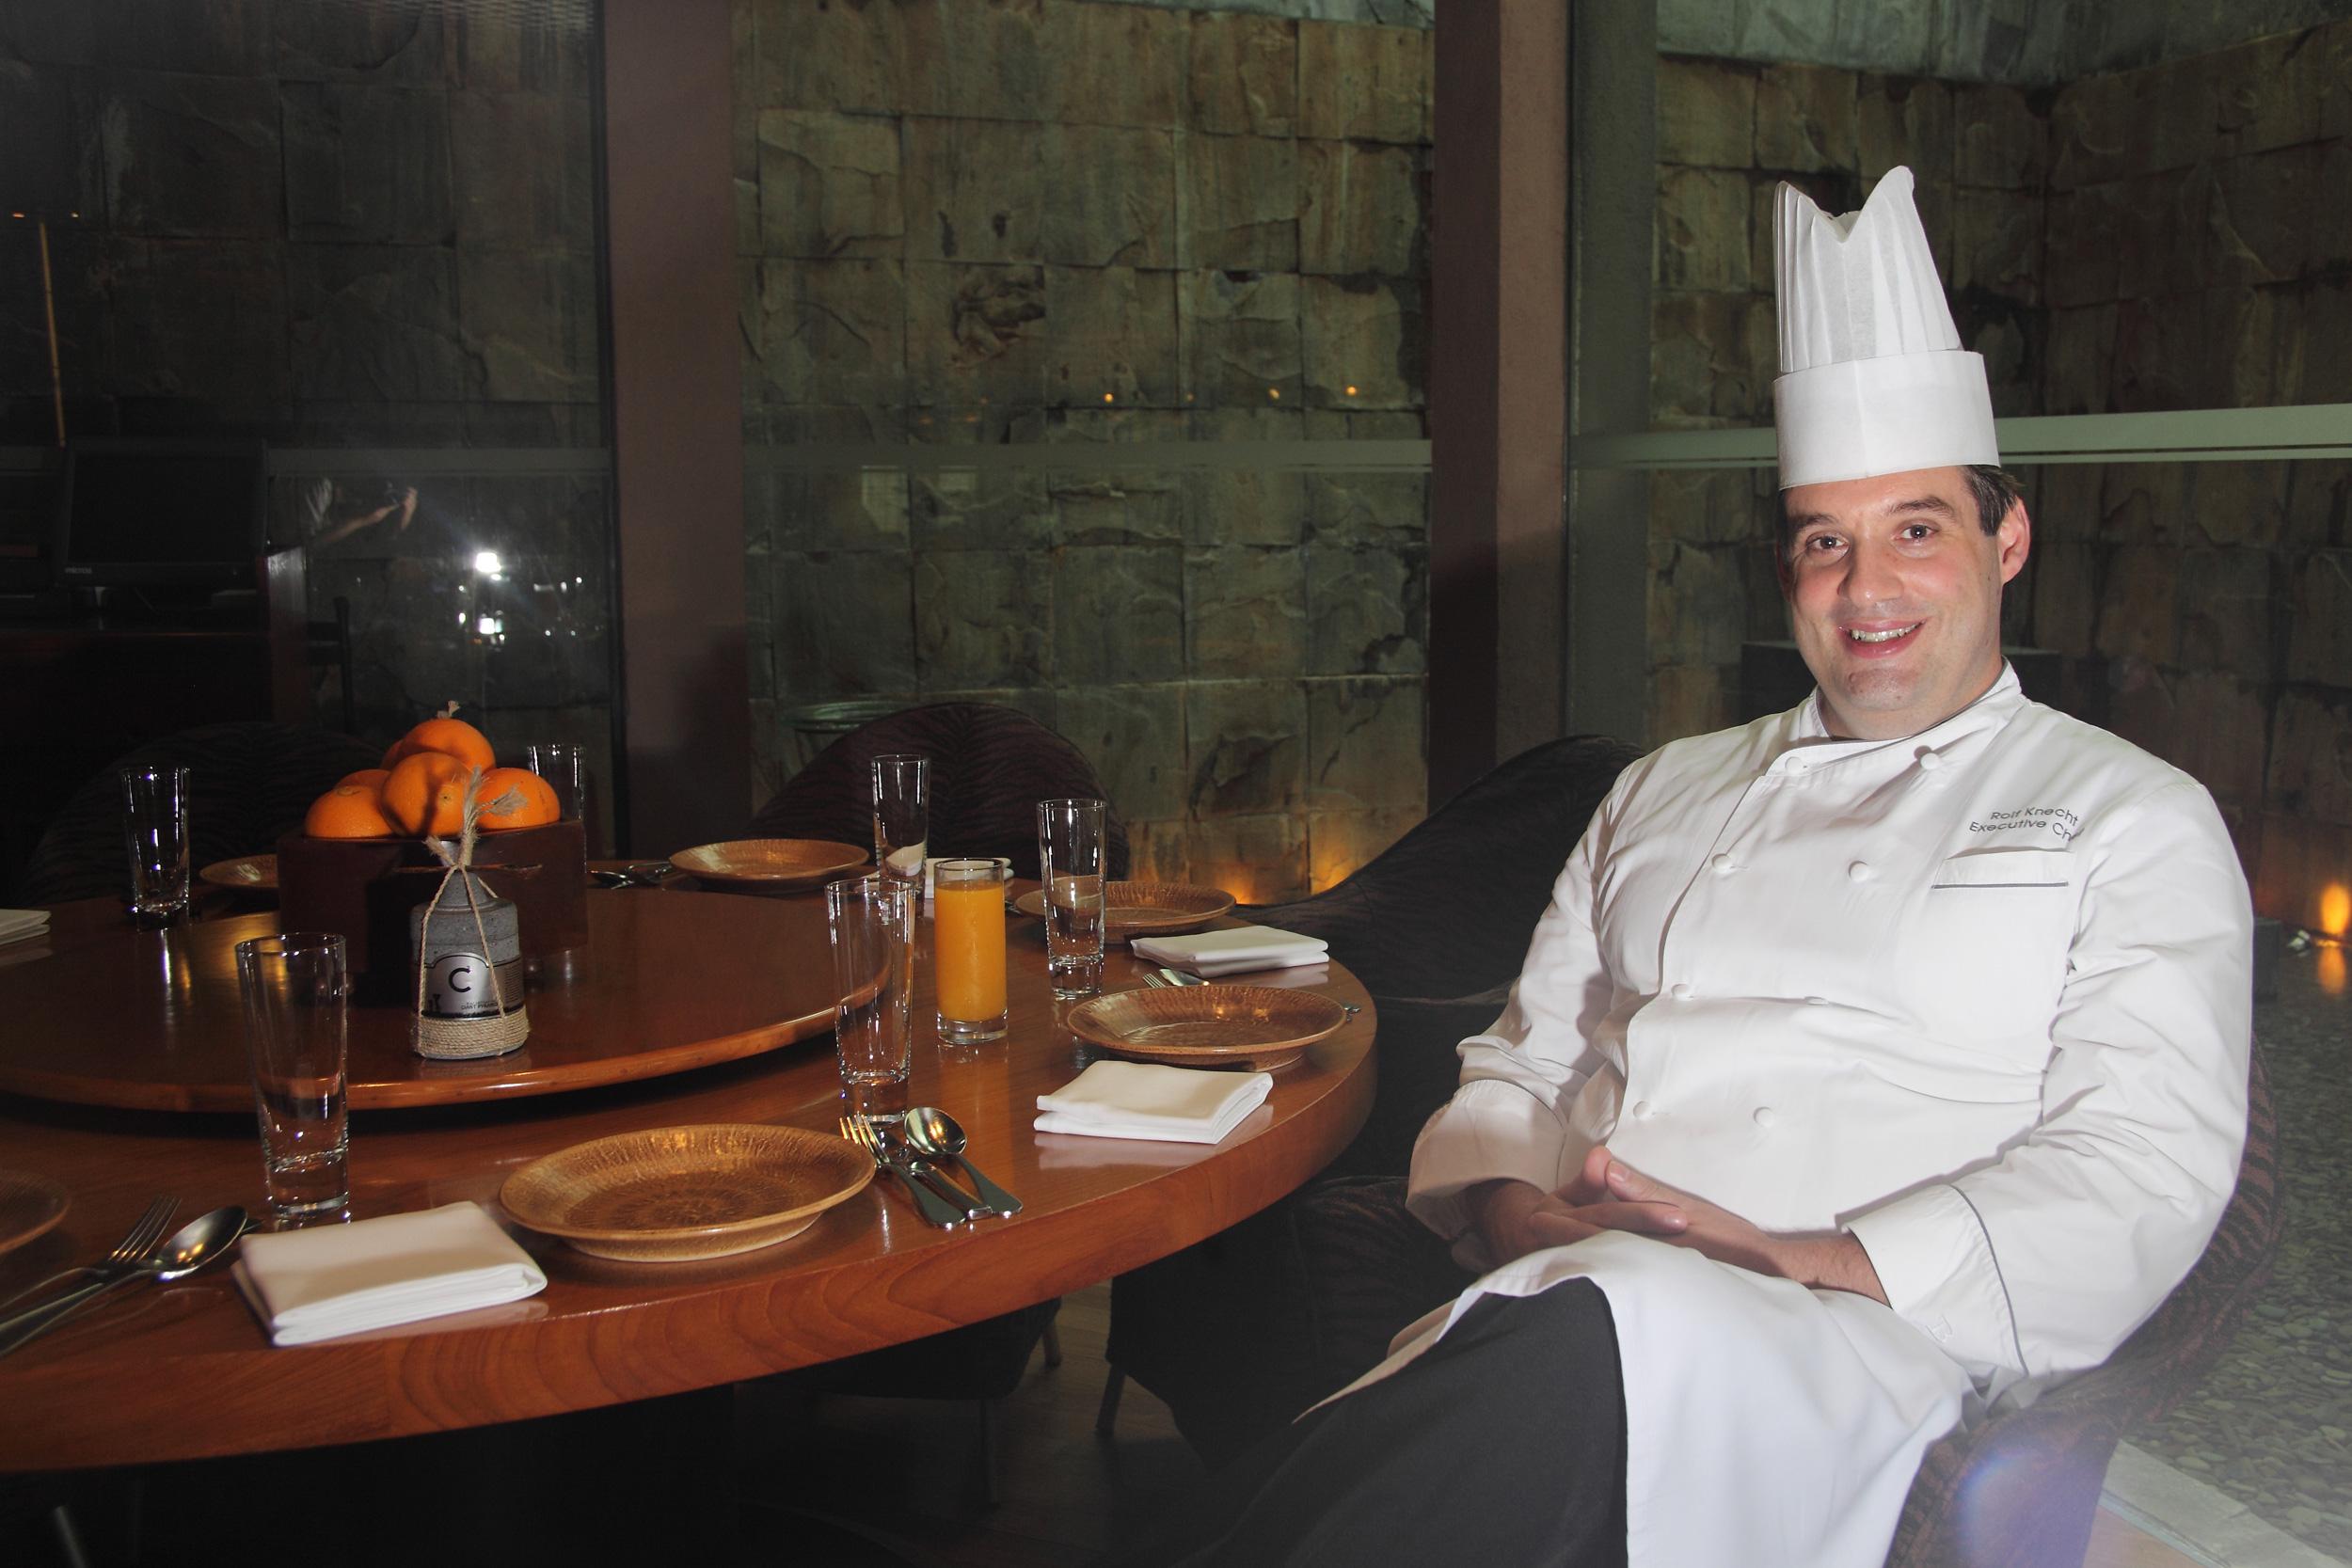 Rolf Knecht, Executive Chef Grand Hyatt Jakarta yang Gemar Blusukan ke Pasar Tradisional